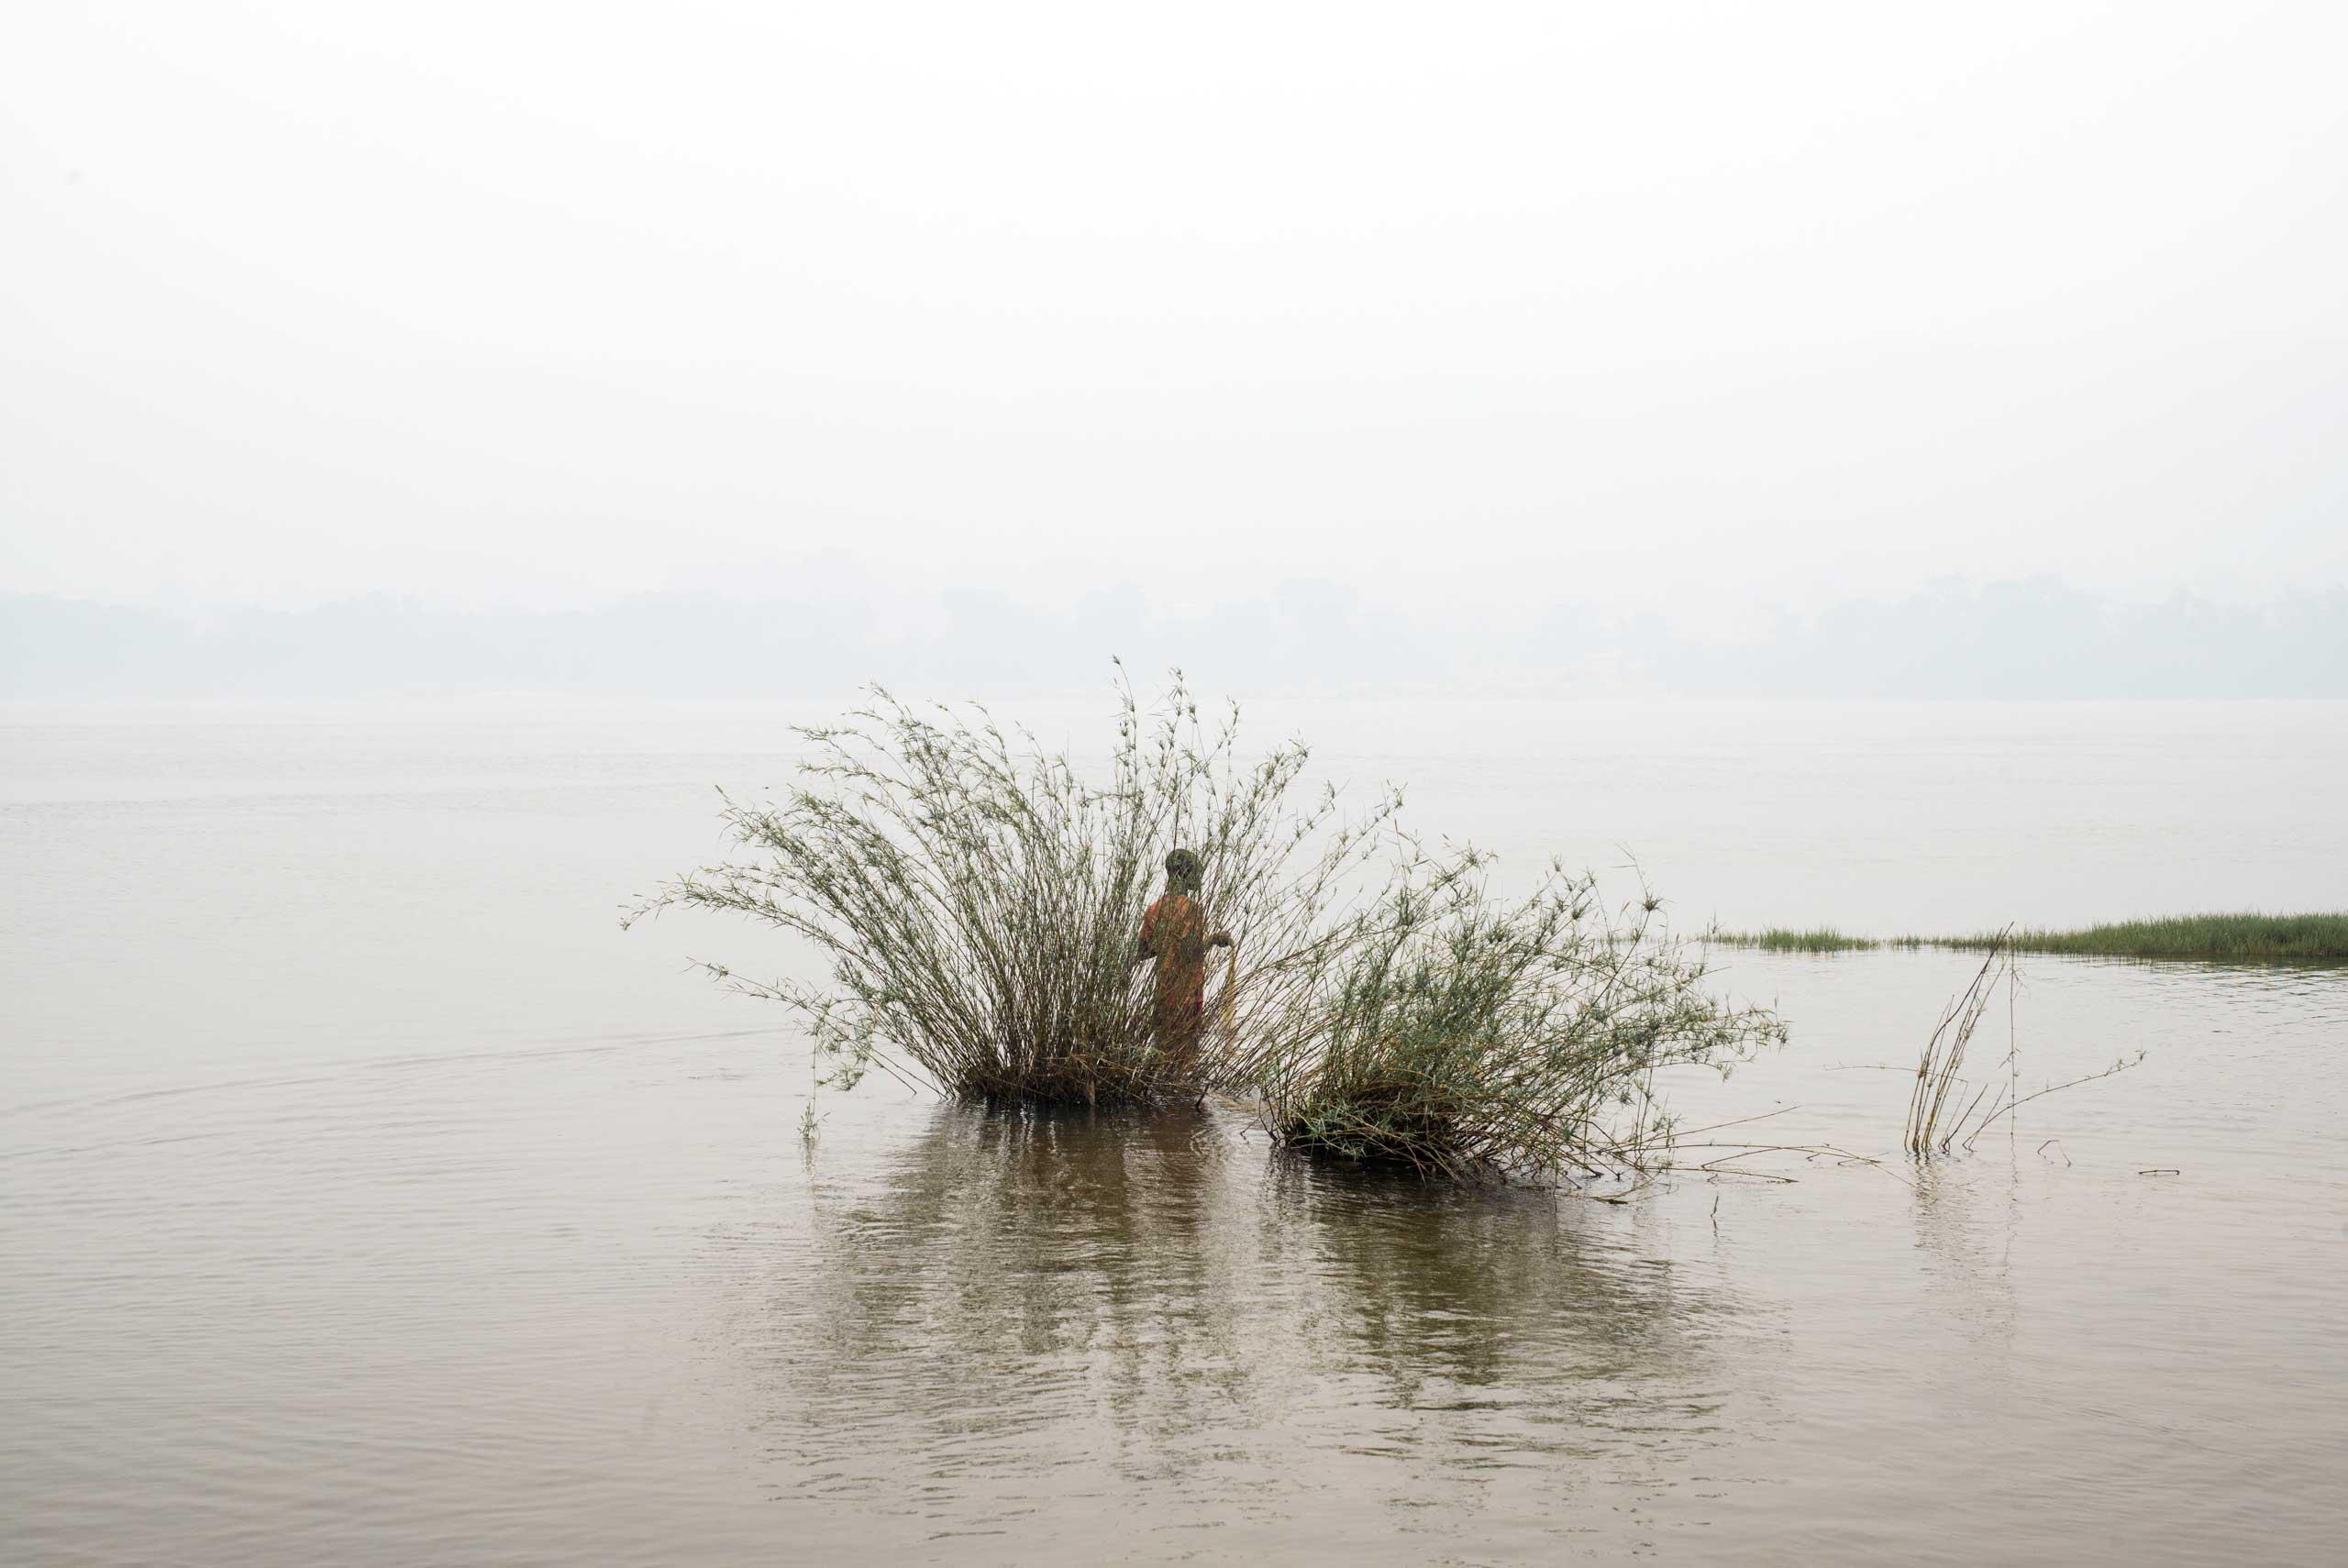 A fisherman on the Oubangui river.